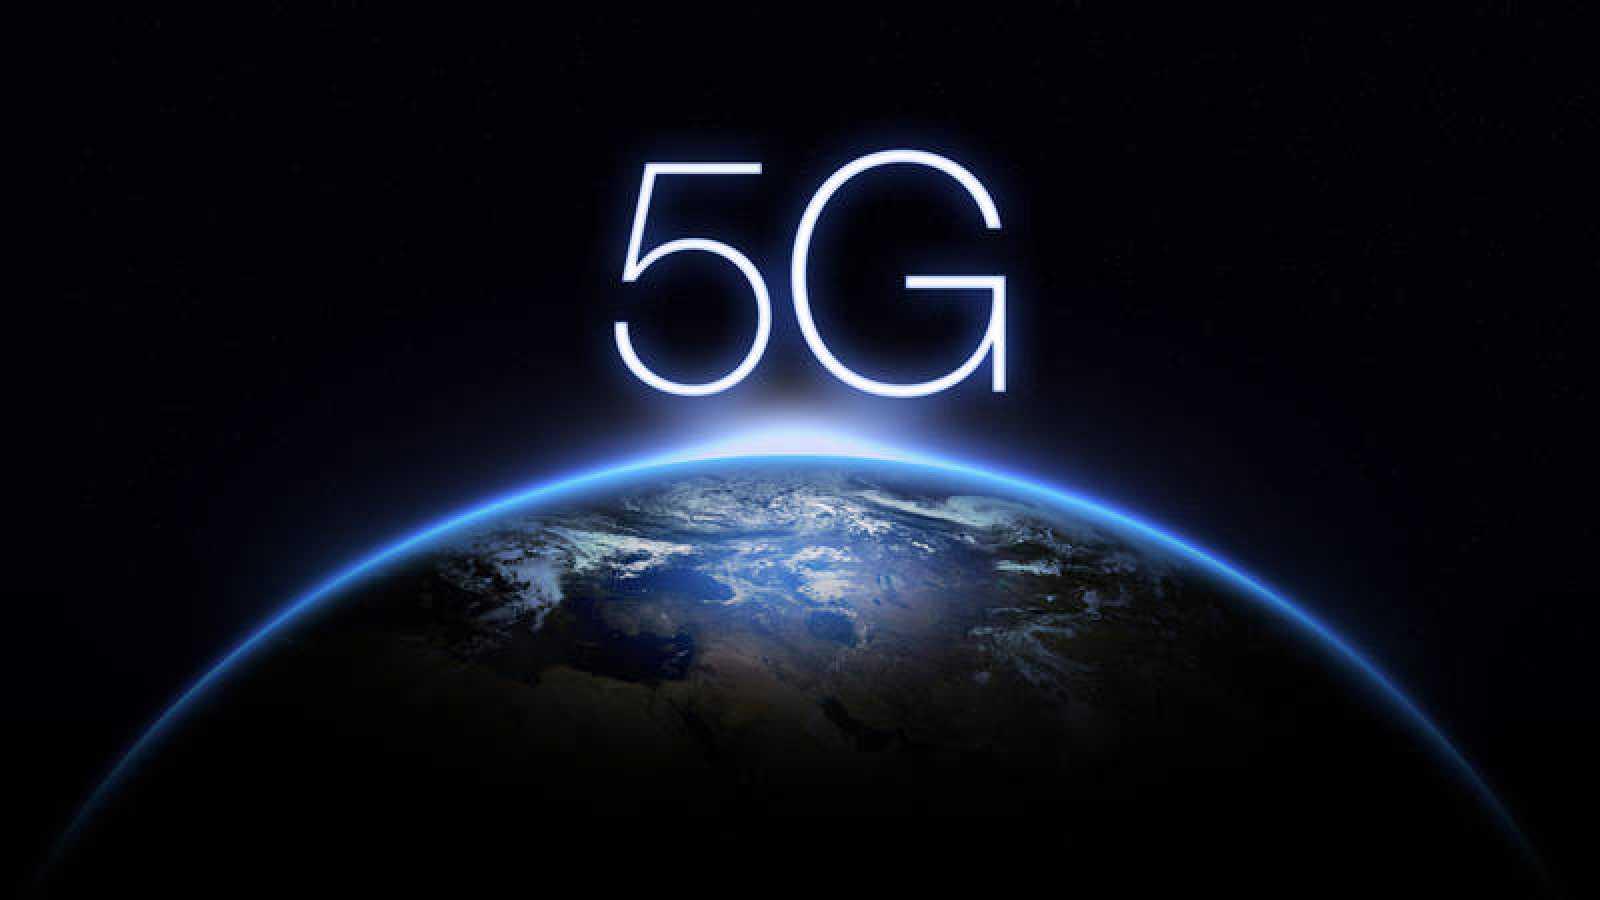 Jornada 5G i Salut